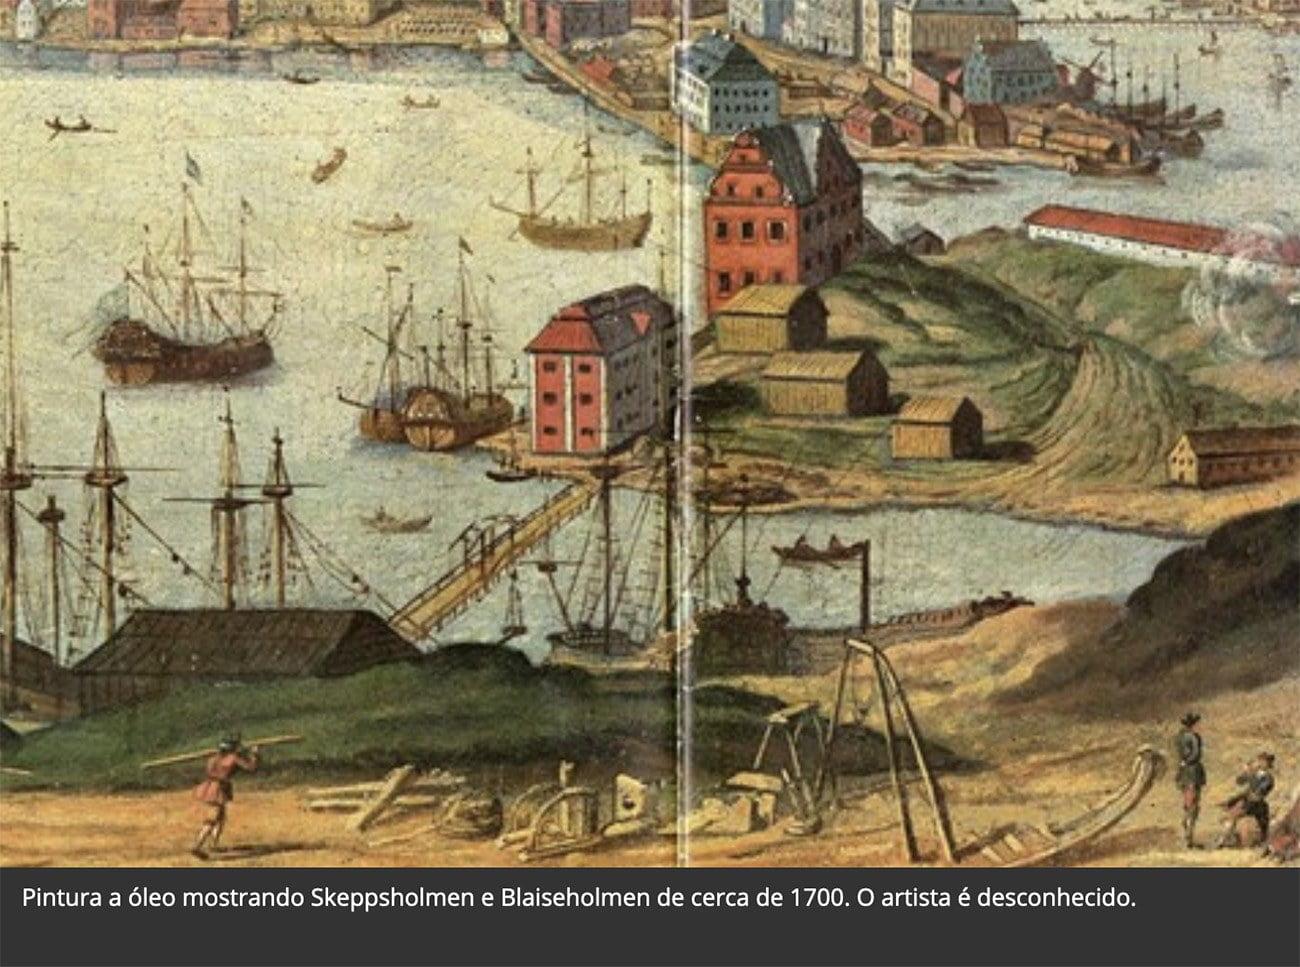 Imagem do estaleiro onde foi construído o navio Vasa